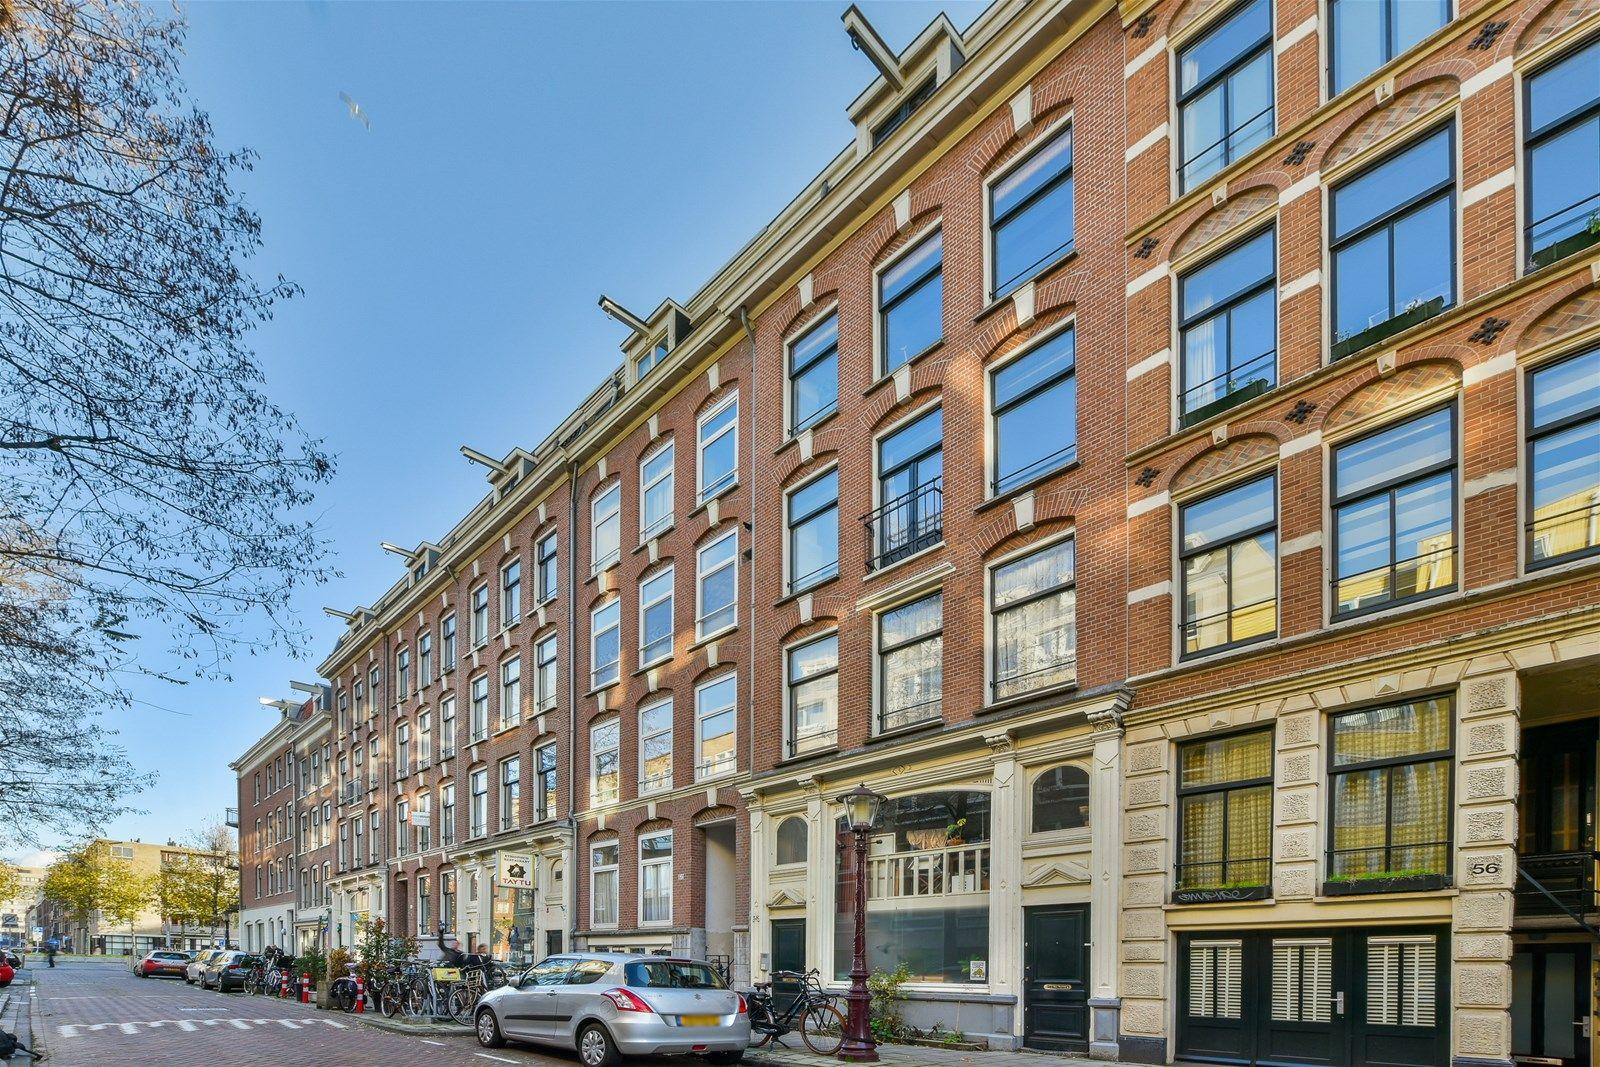 Blasiusstraat 58-2, Amsterdam